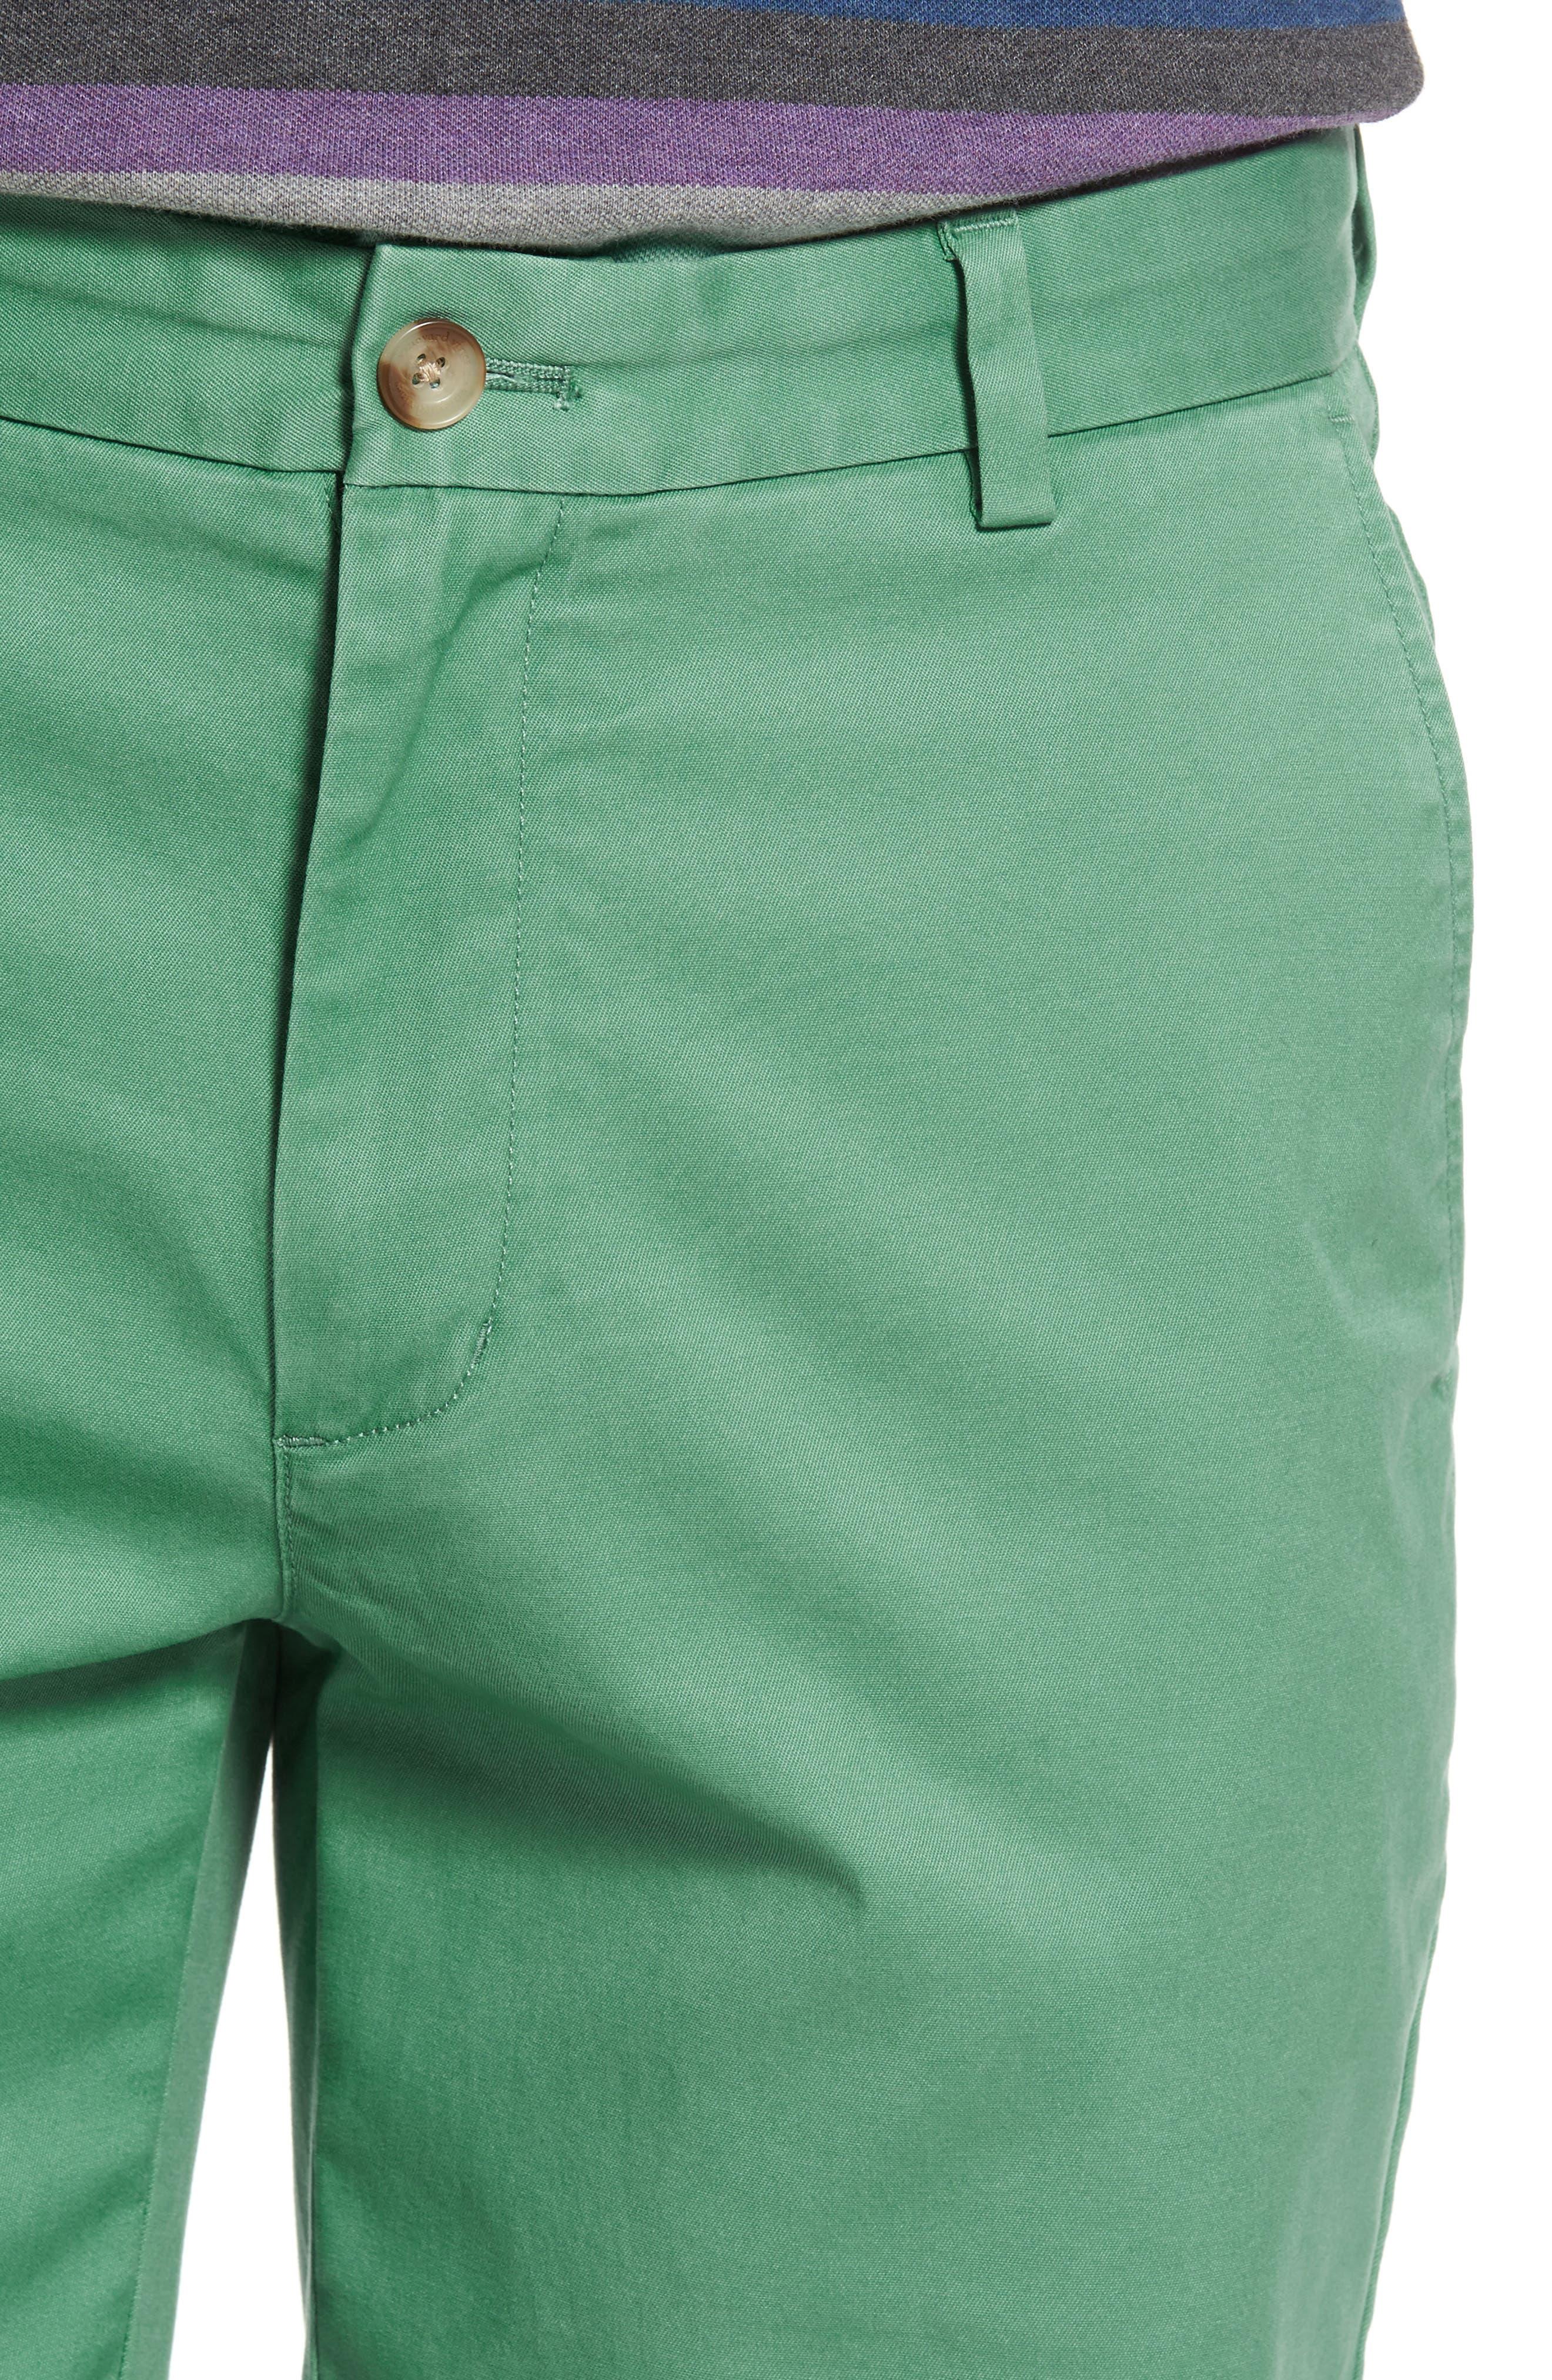 9 Inch Stretch Breaker Shorts,                             Alternate thumbnail 82, color,